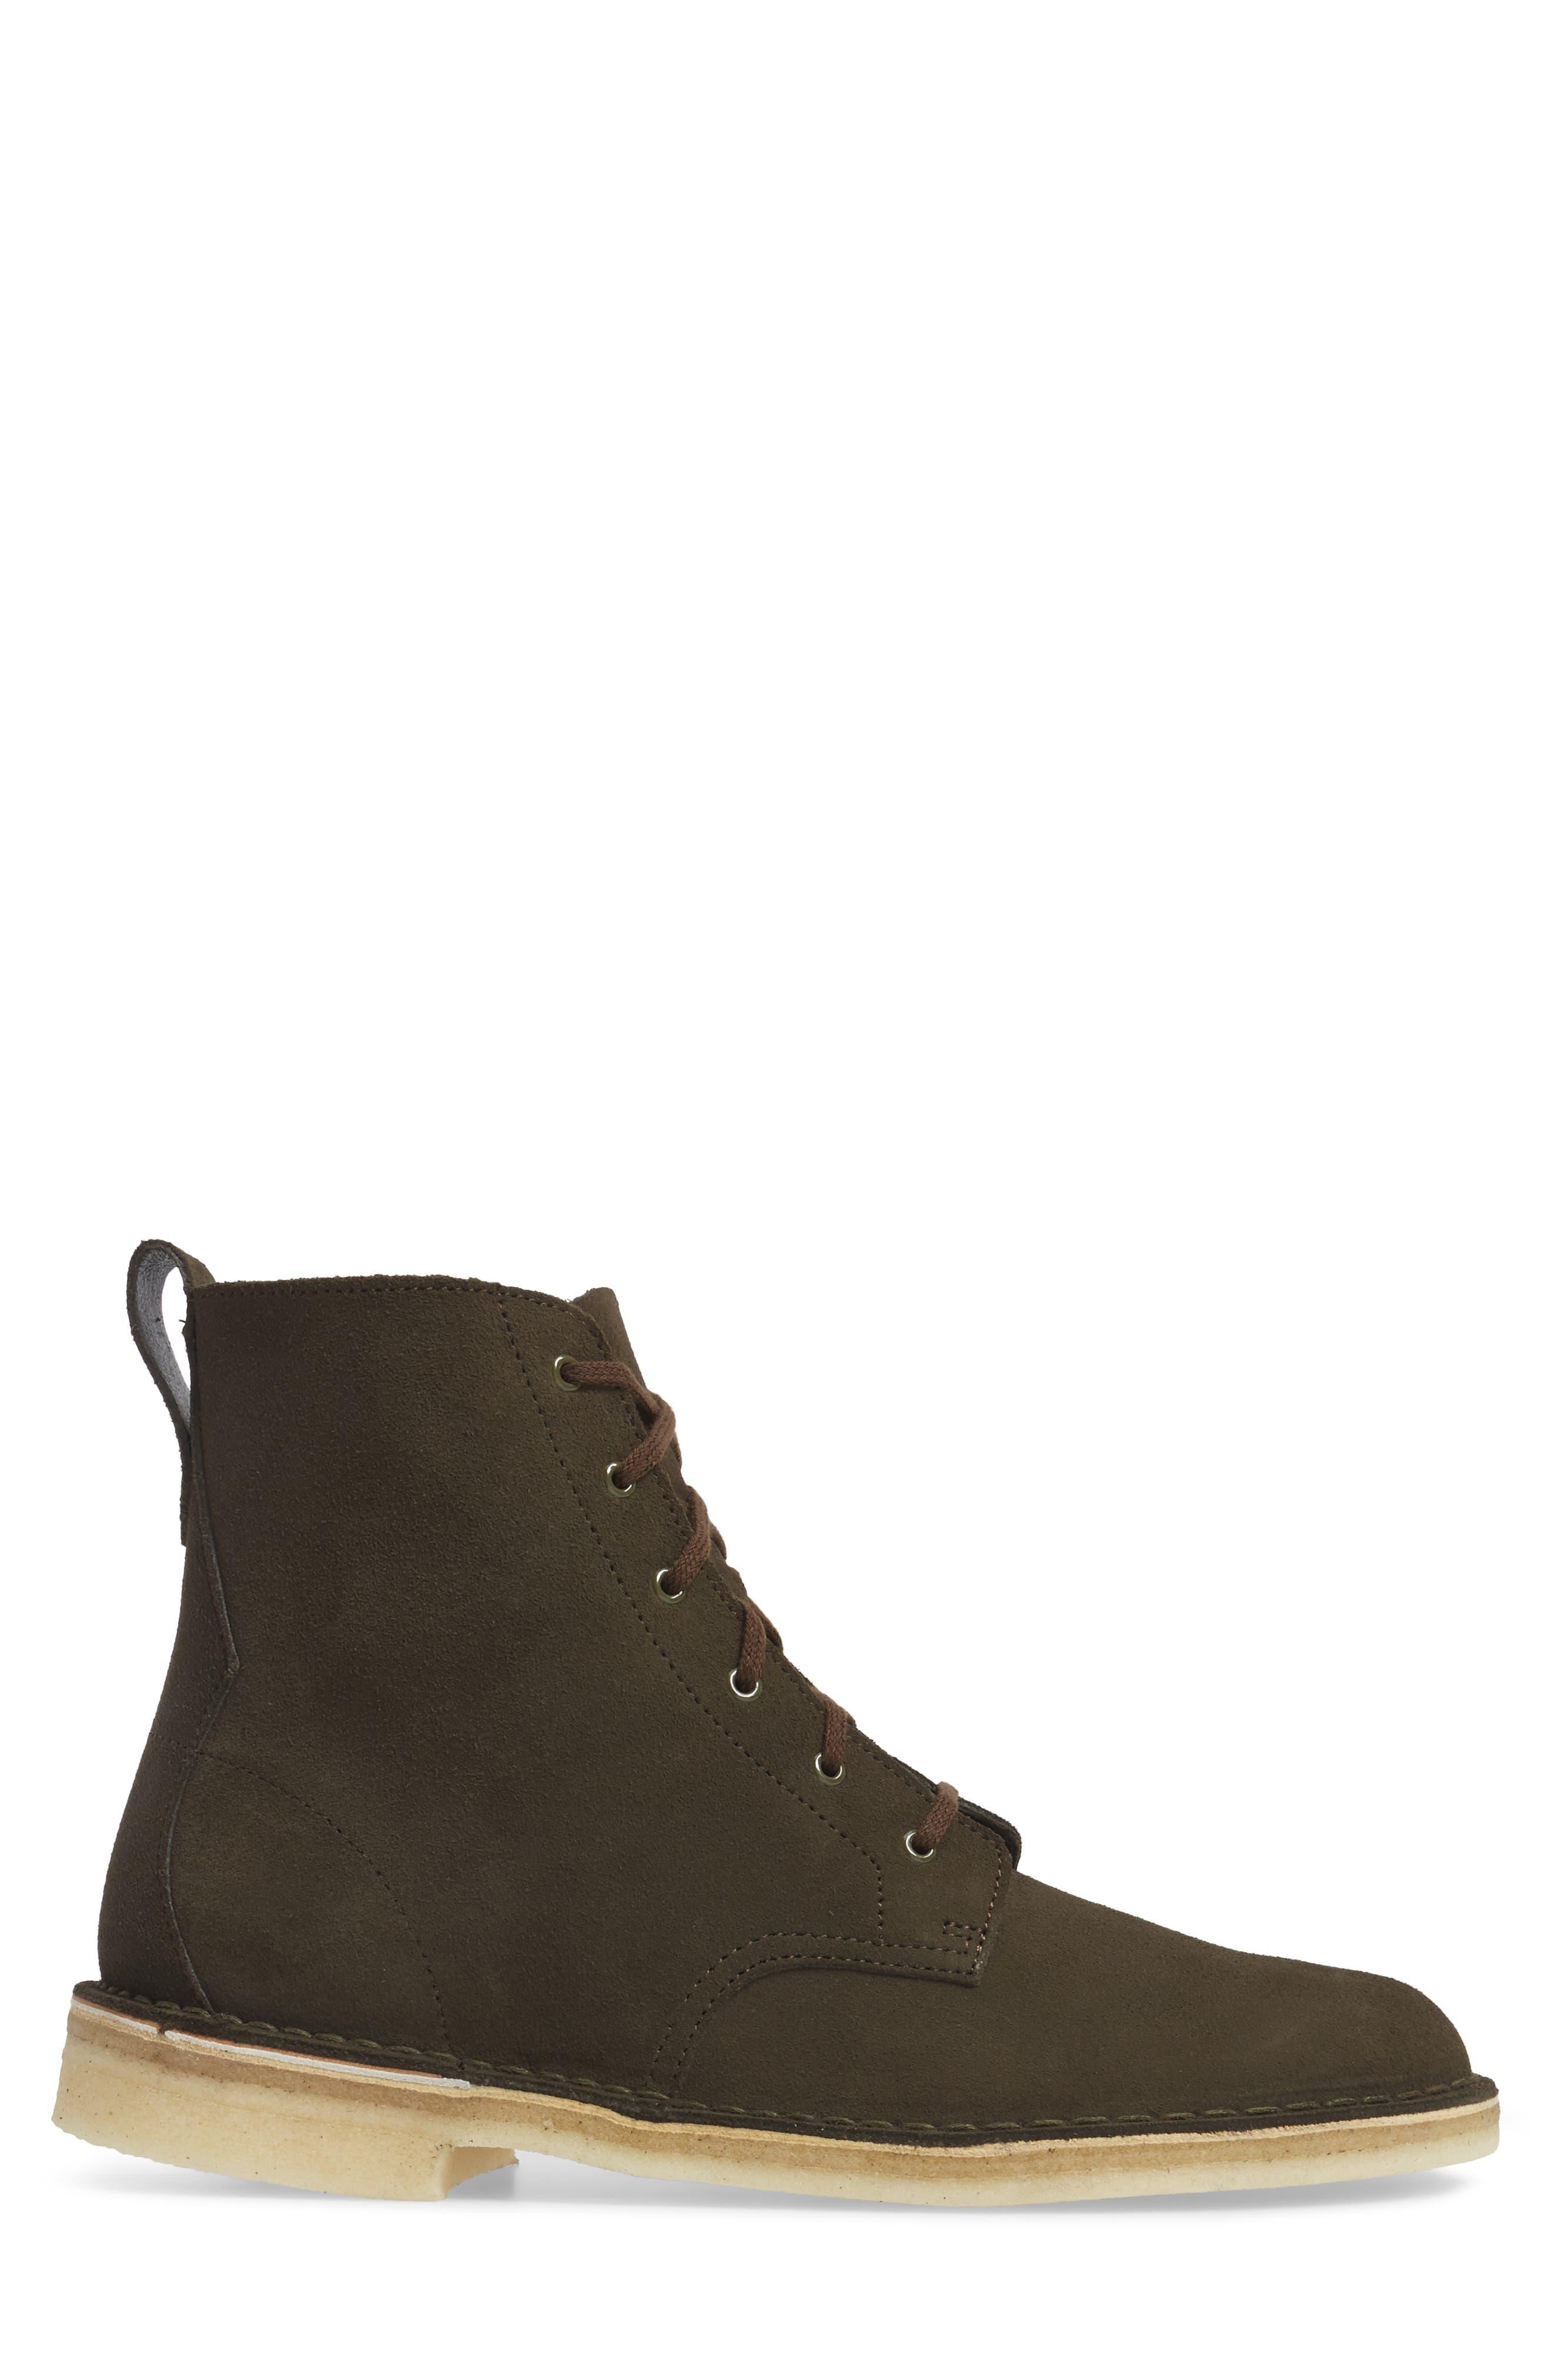 Alternate Image 3  - Clarks® Originals 'Desert Mali' Boot (Men)